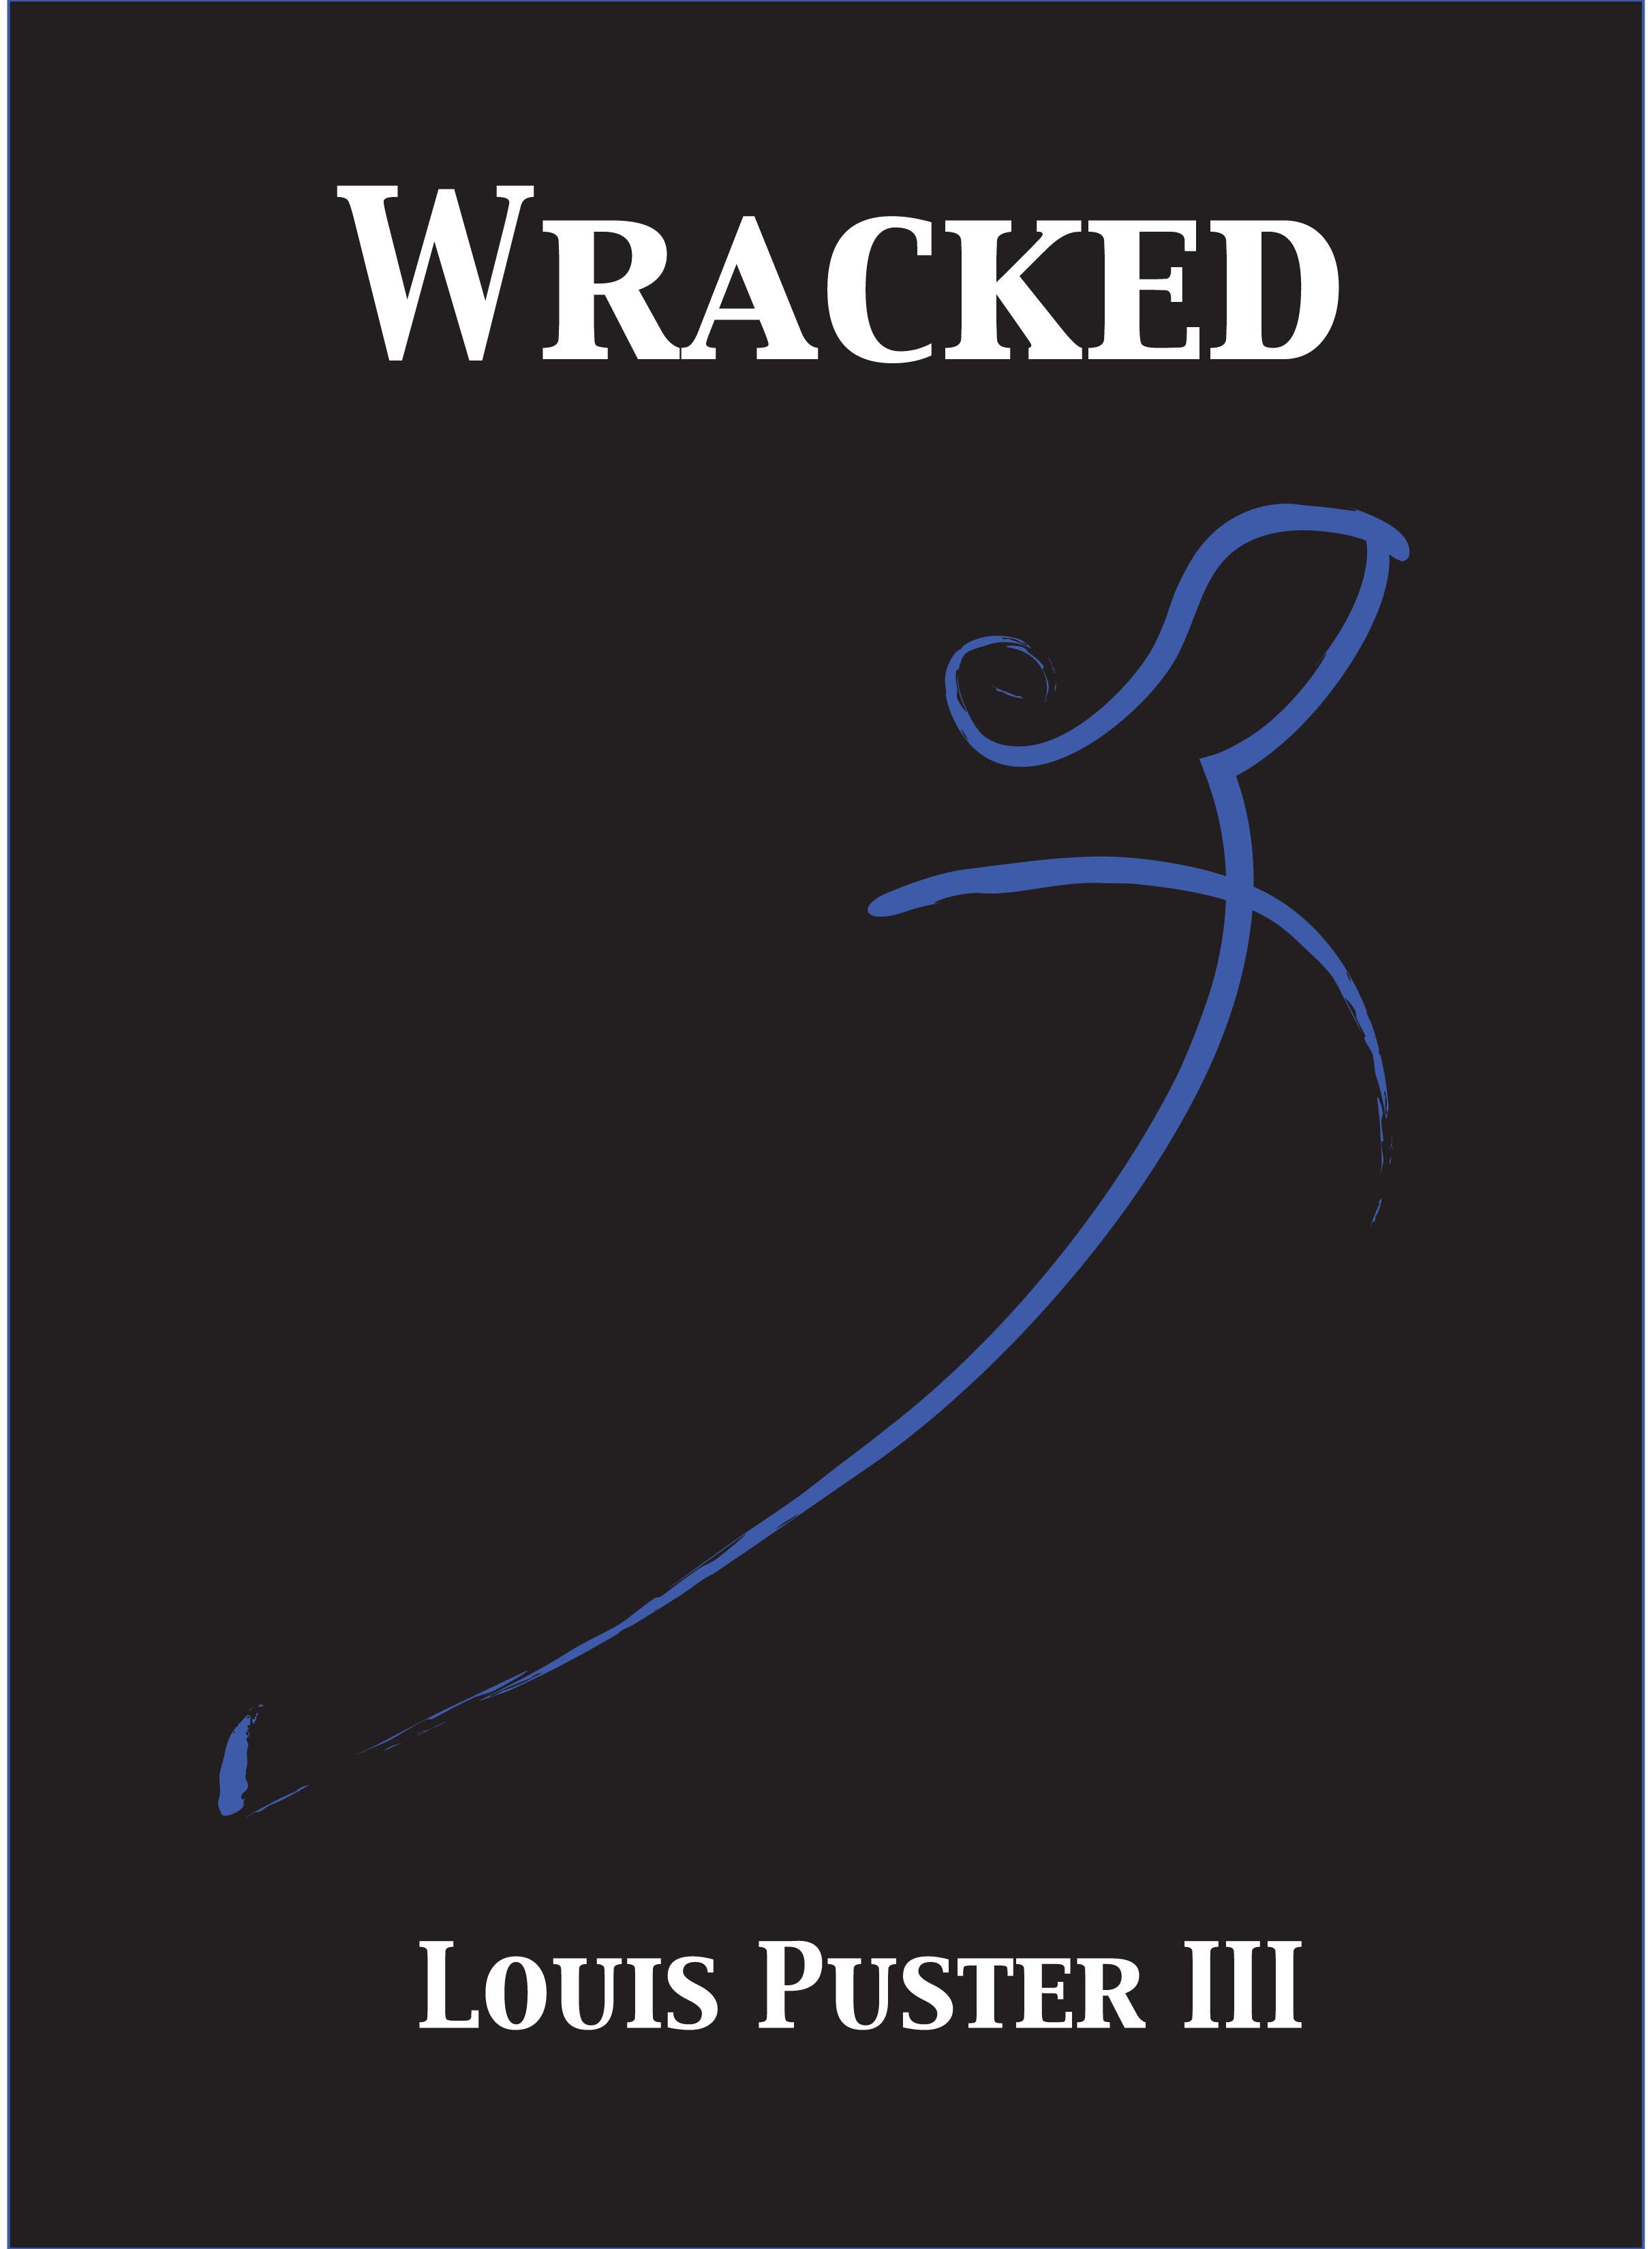 Wracked's original cover